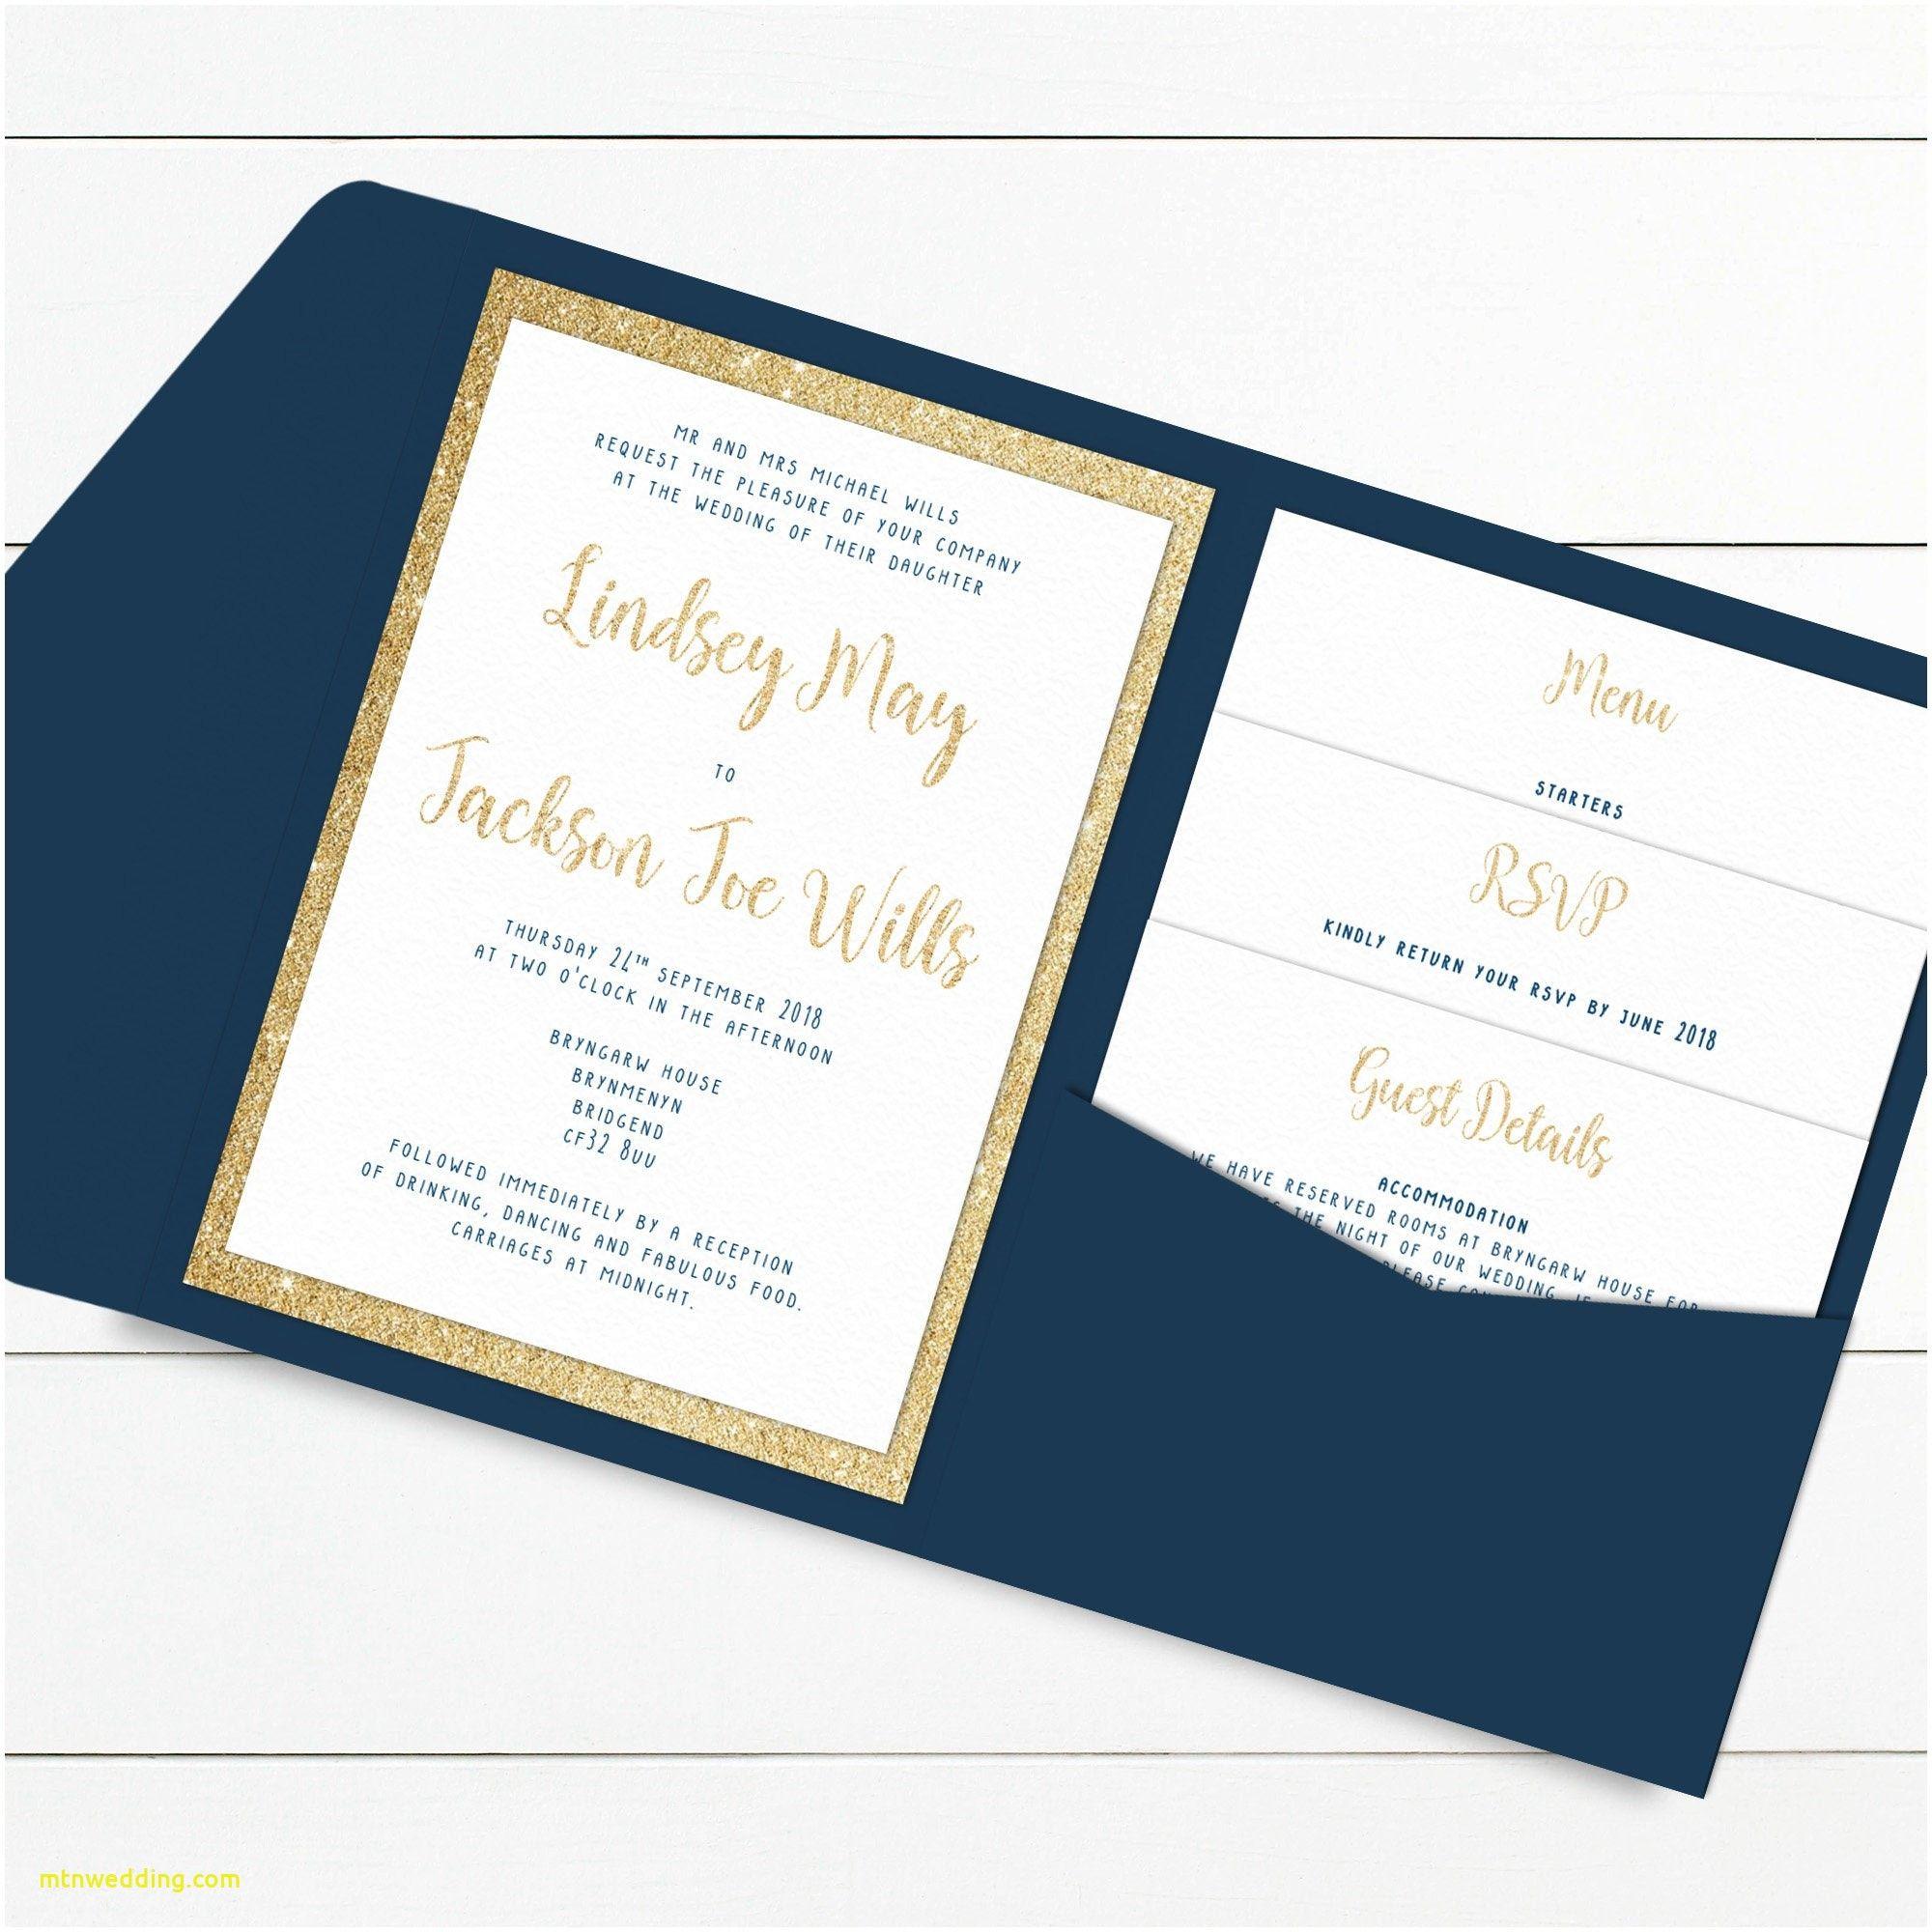 Elegant Dress Code Wedding Invitation Uk